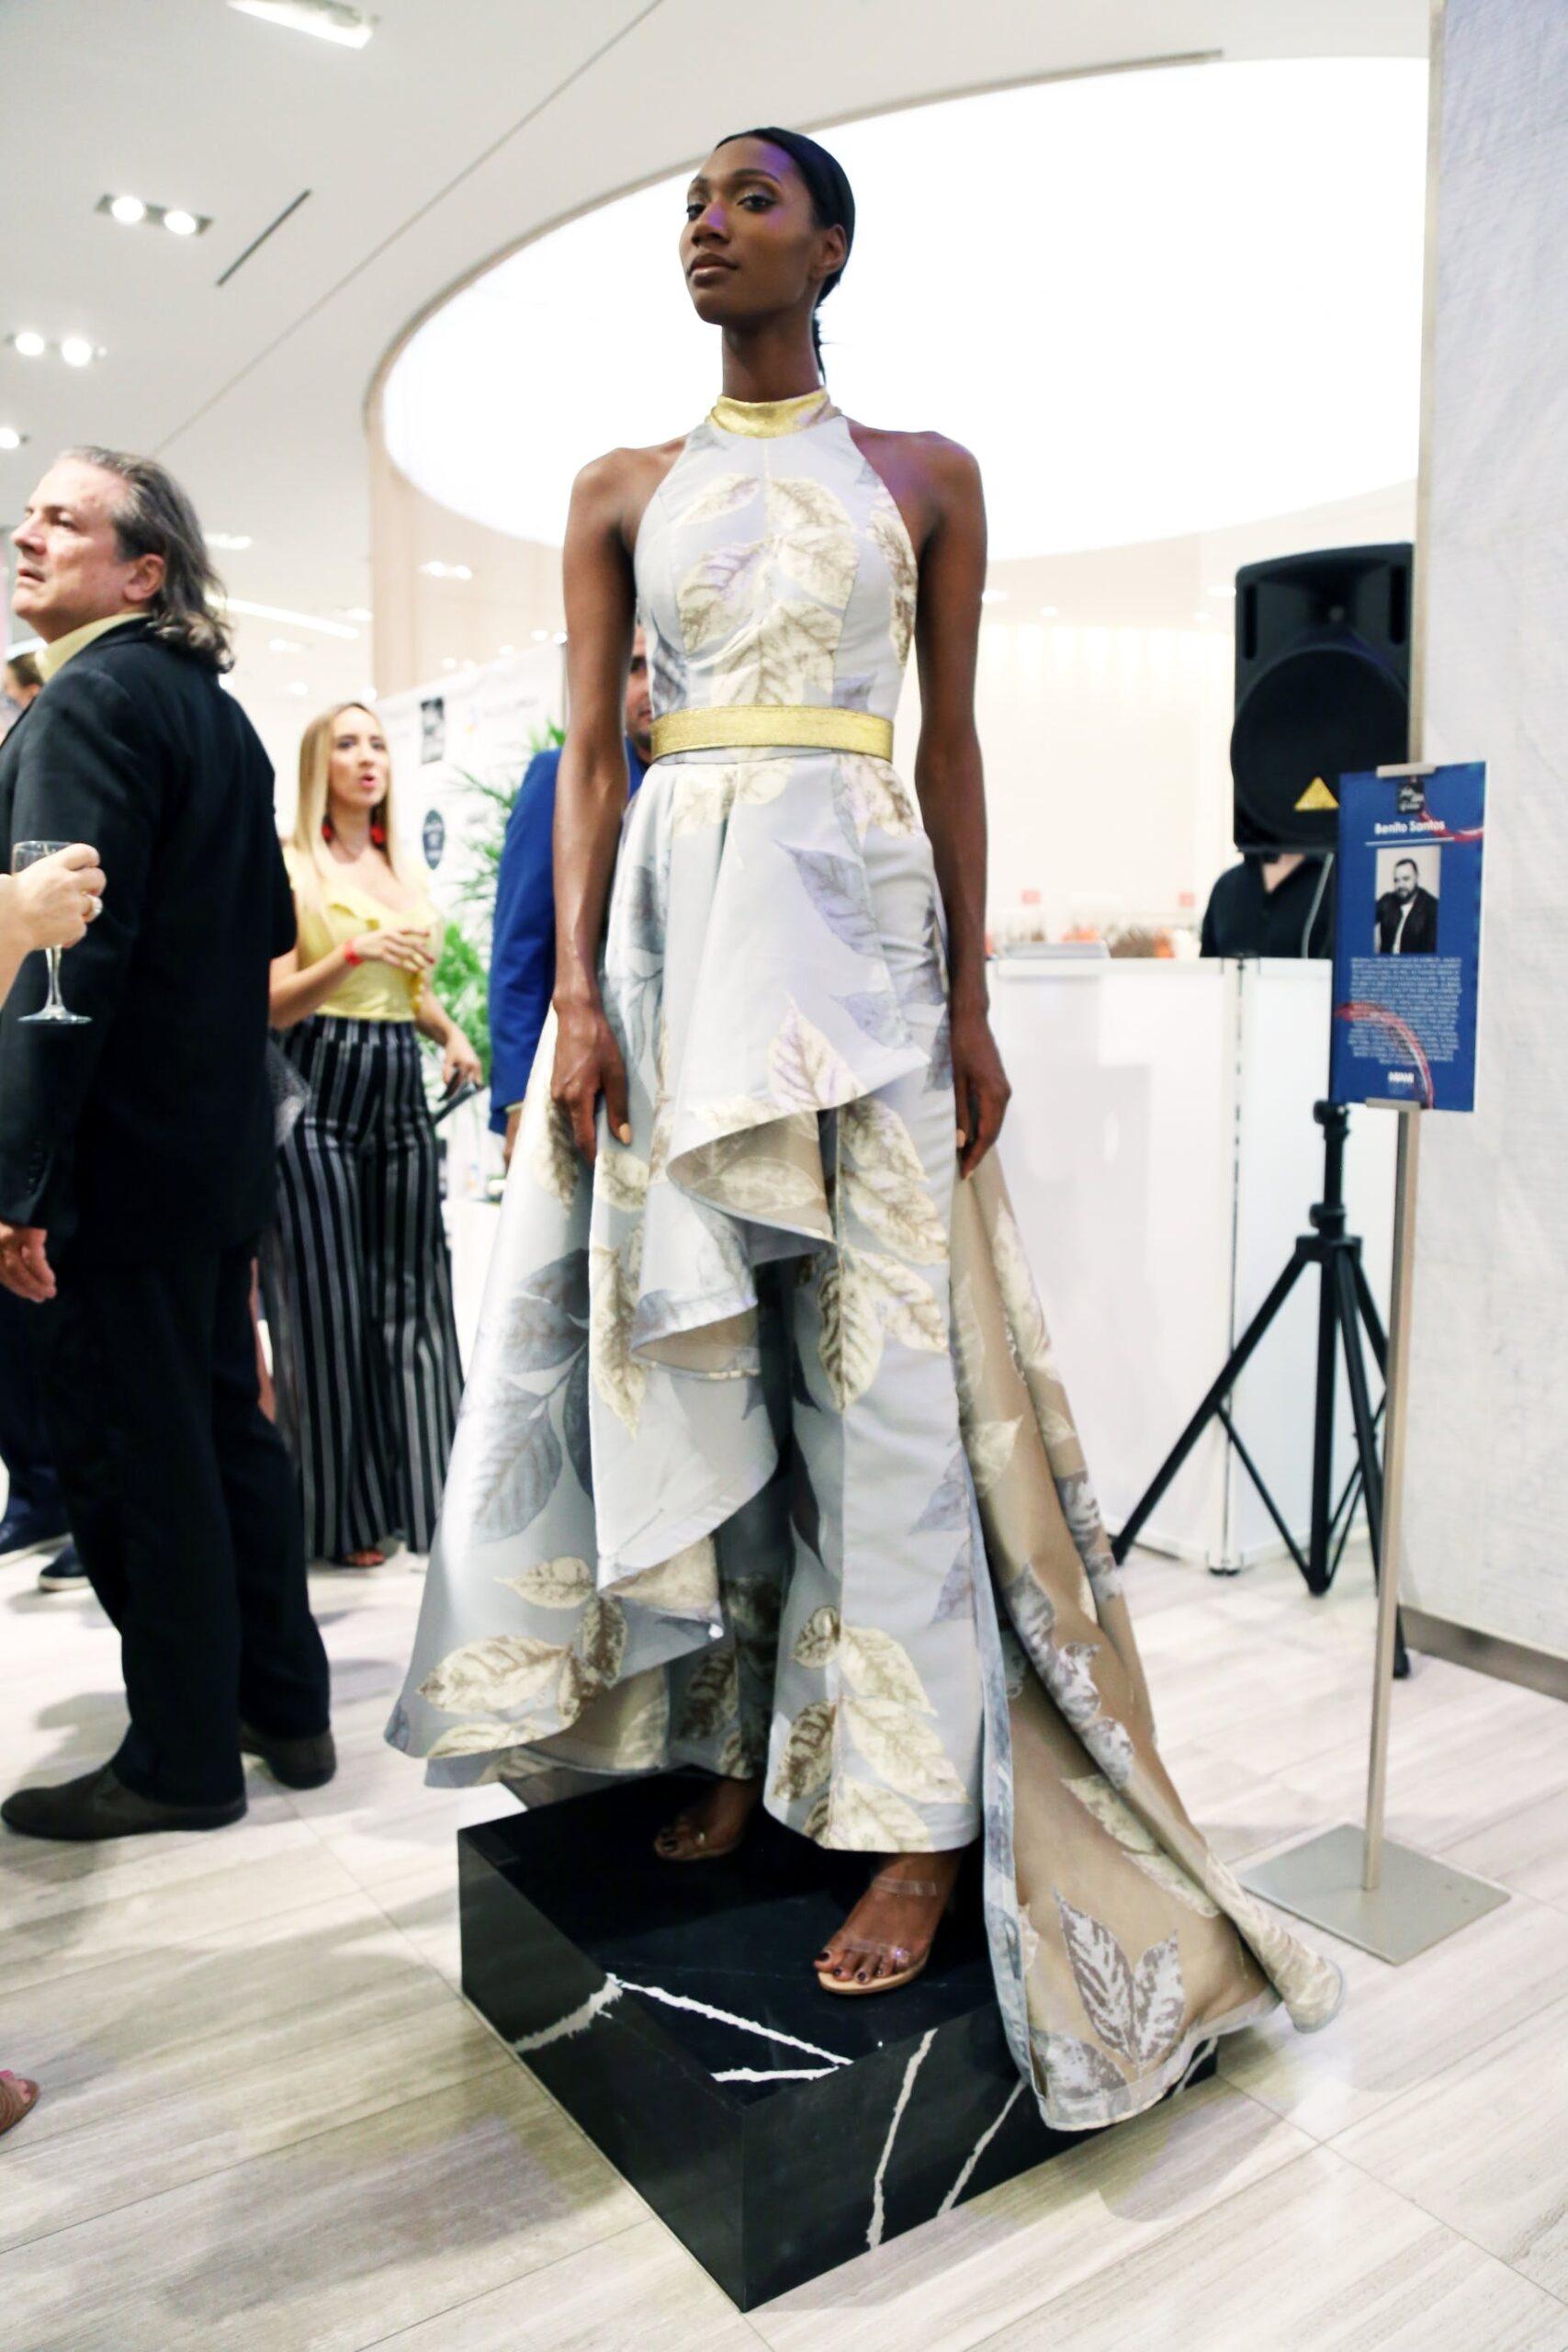 Image of IMG 5175 1 2 scaled in Silestone® sponsors 2018 Miami Fashion Week - Cosentino